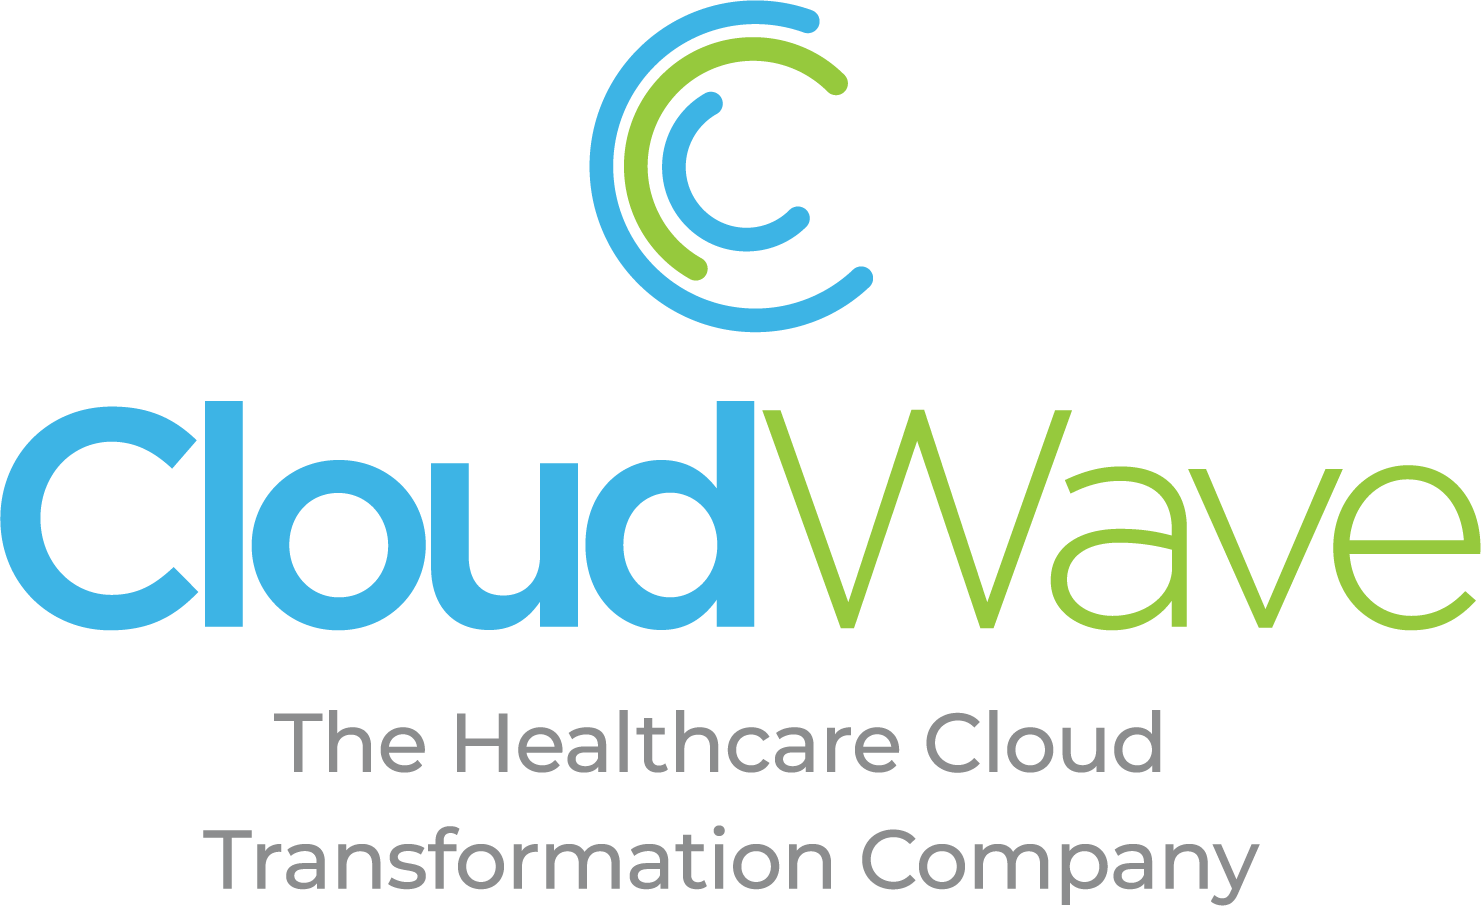 CloudWave_process_logo_v2.png